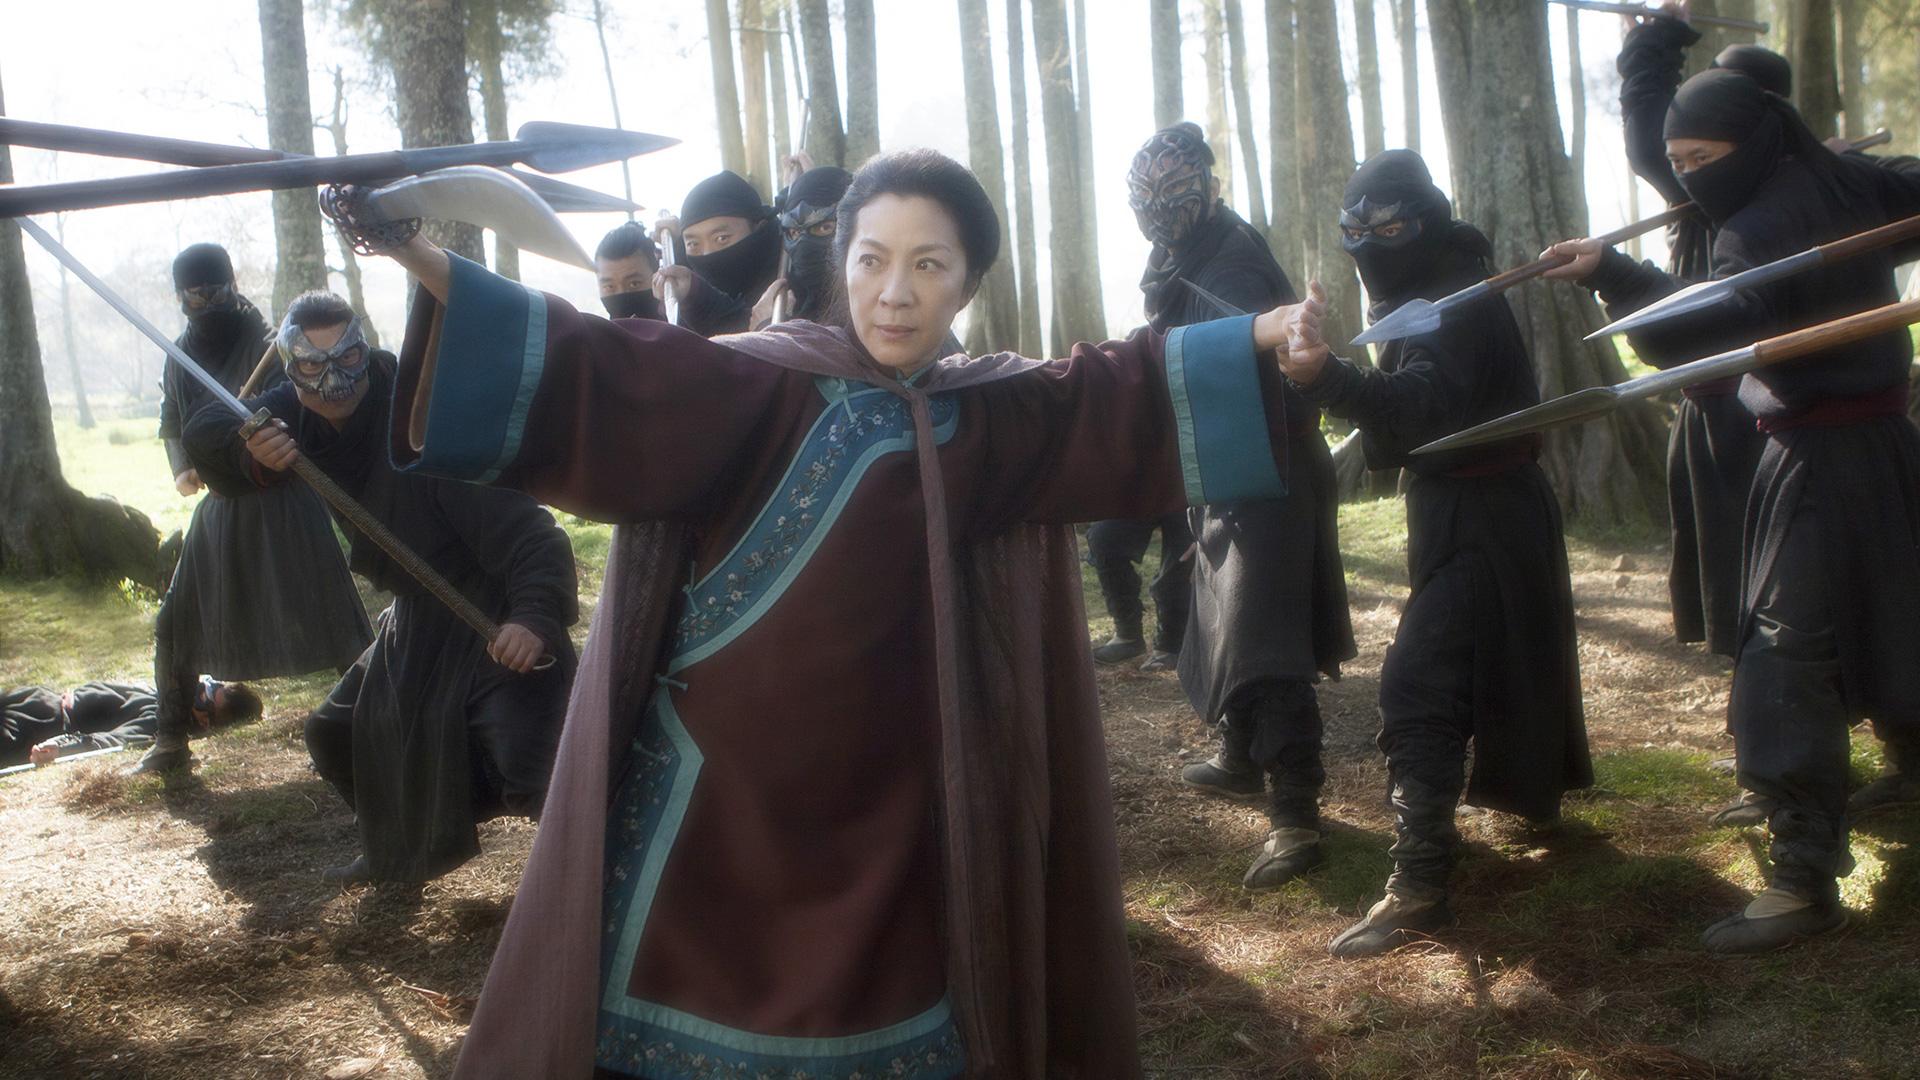 Crouching-Tiger-Hidden-Dragon-Sword-of-Destiny-wallpaper-HD-Michelle-Yeoh.jpg